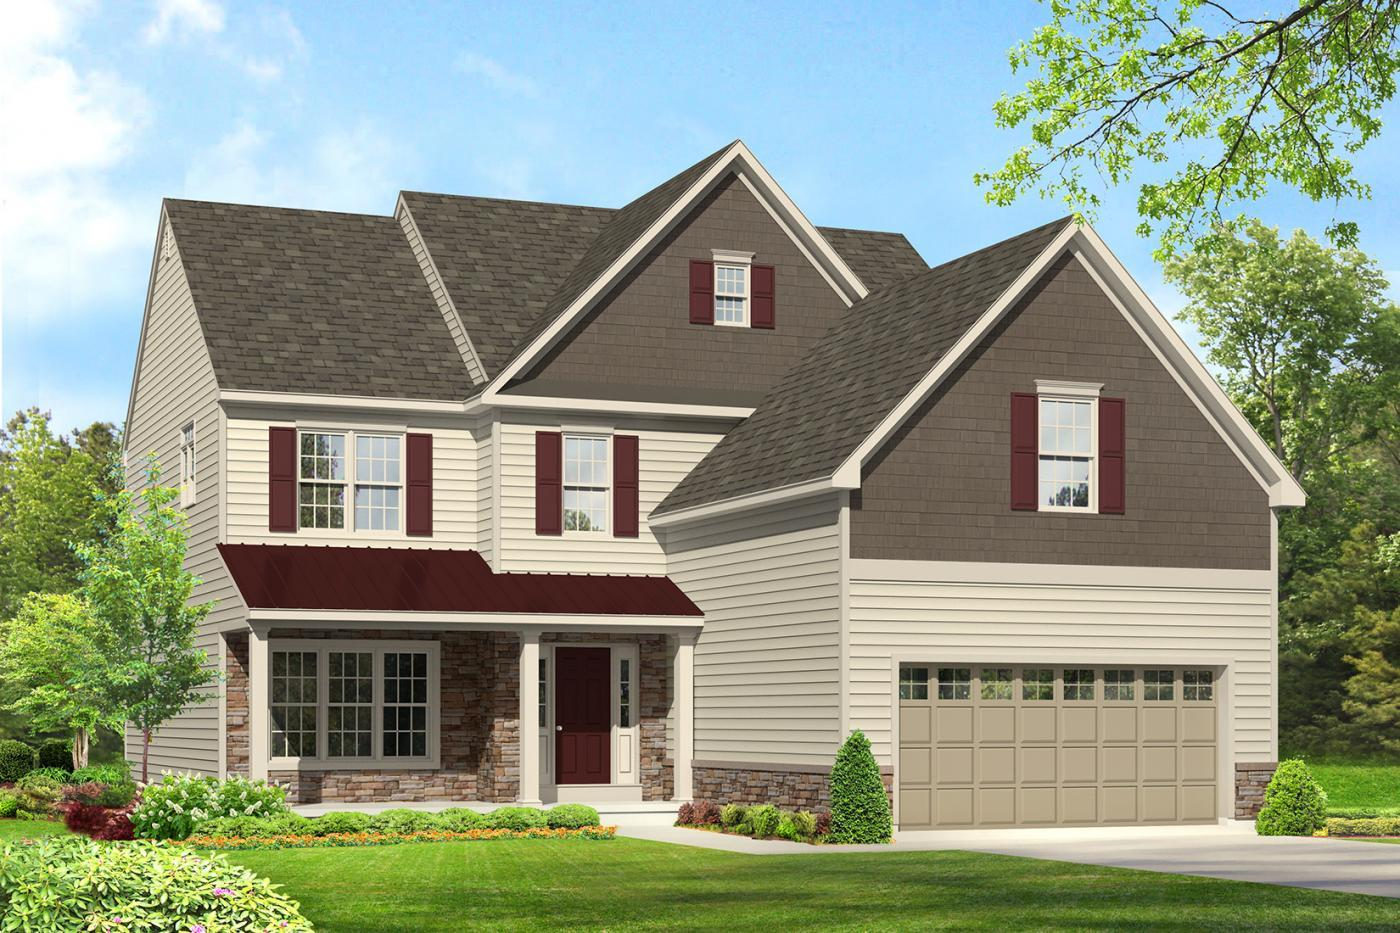 Single Family for Sale at Maple Shade Estates (Bethlehem Twp) - Sherwood Grande 3796 Bethman Rd. Easton, Pennsylvania 18045 United States